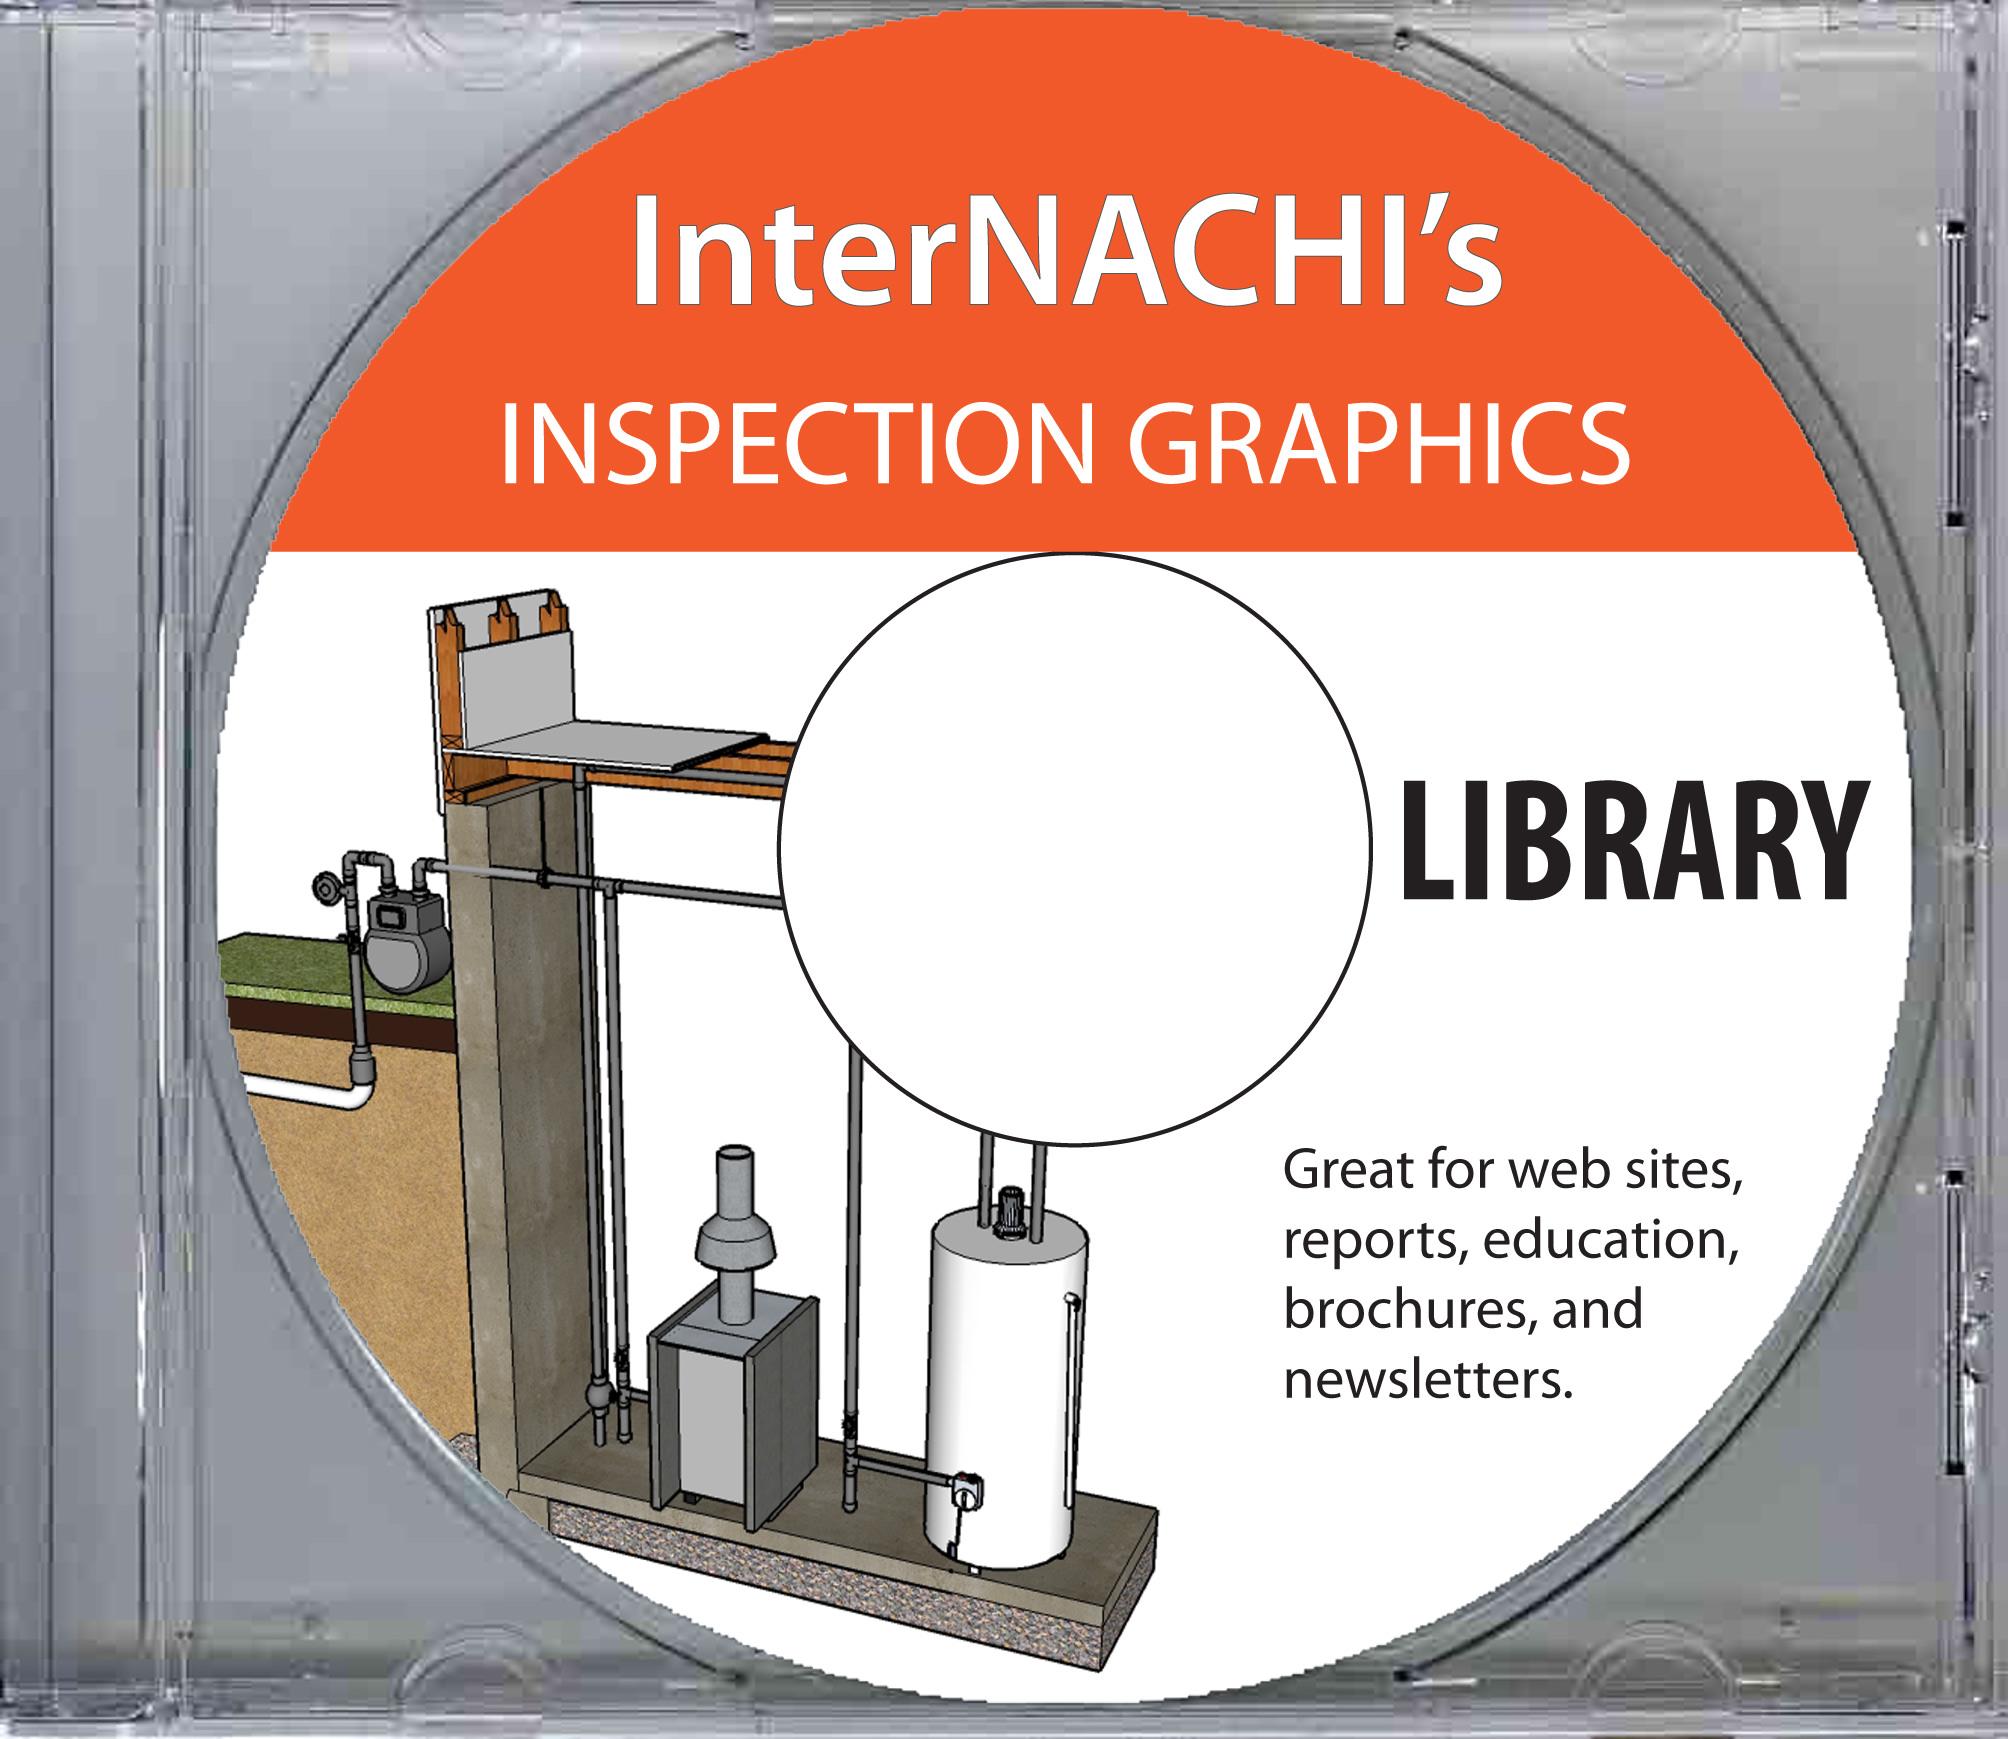 InterNACHI inspection graphics library.